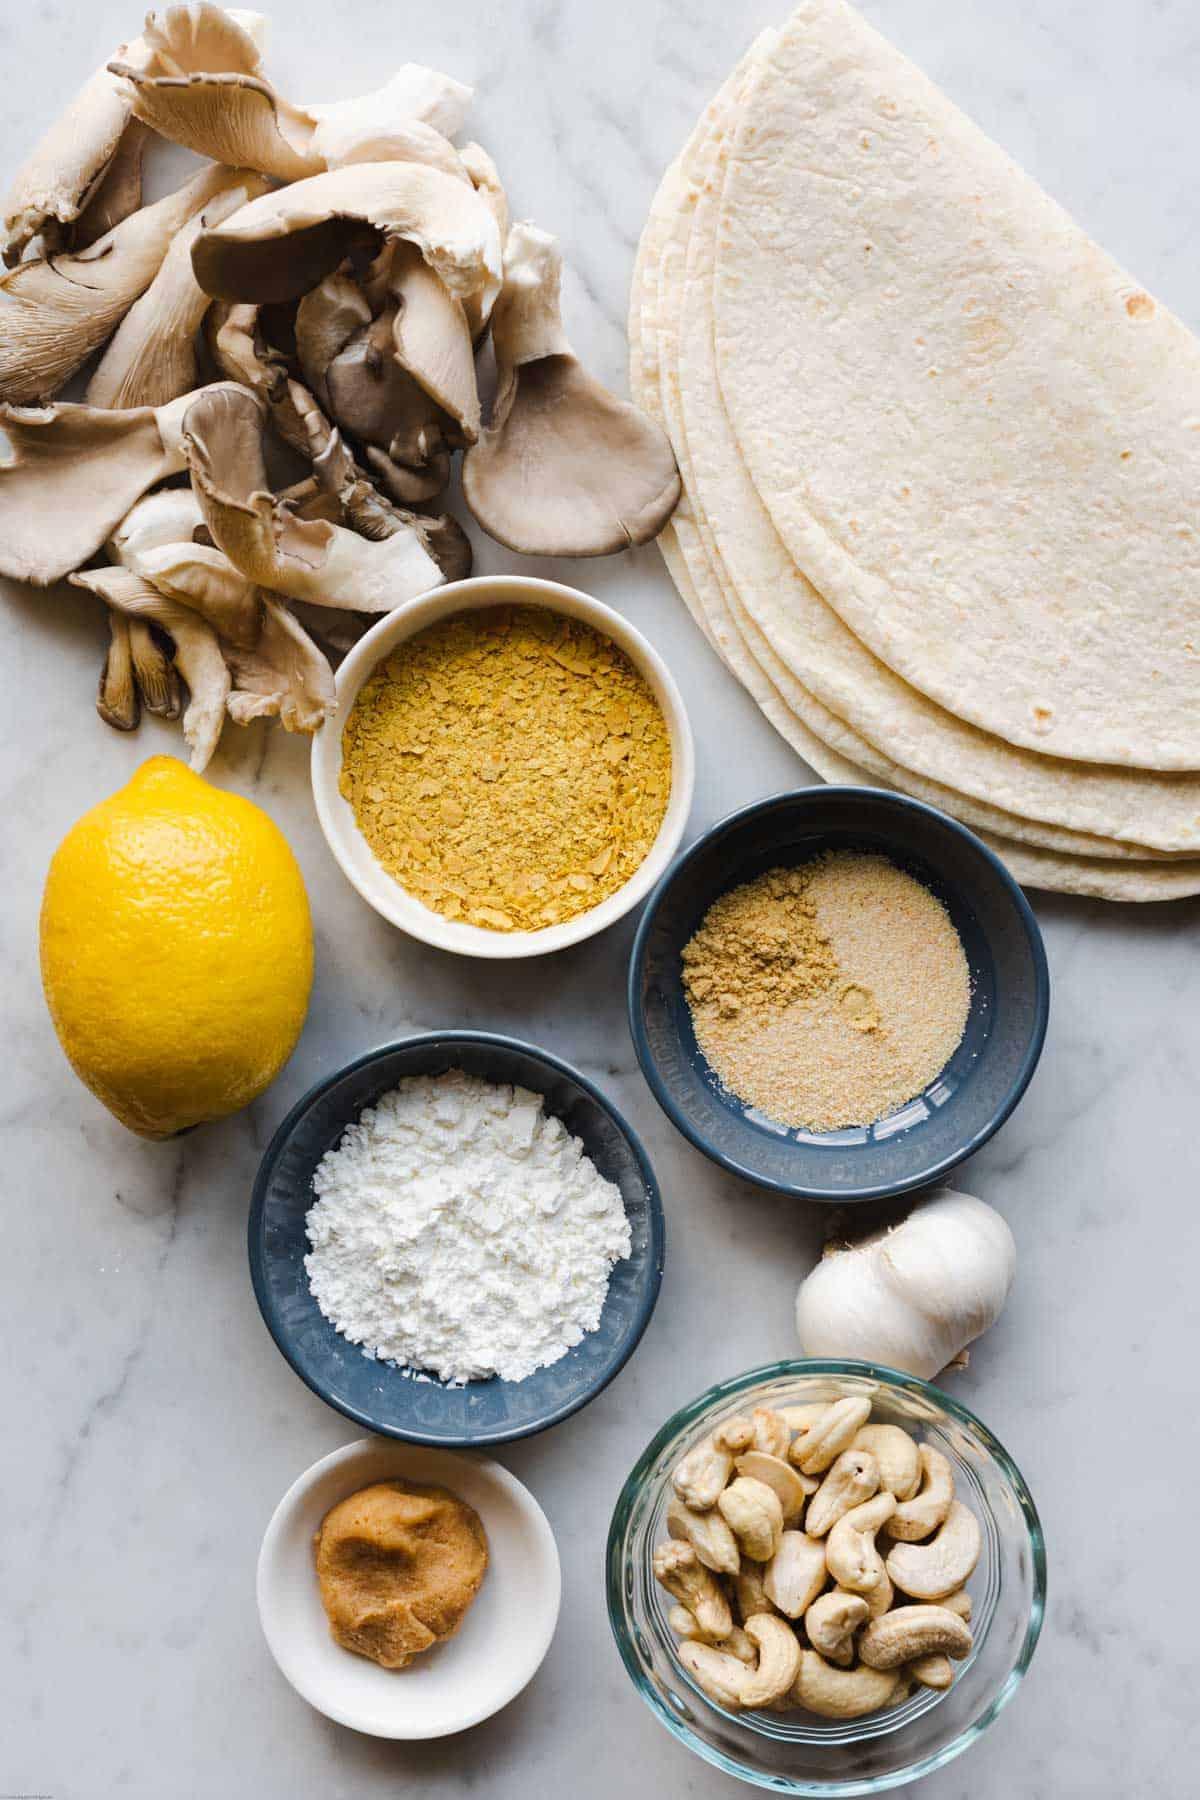 Ingredients for making Easy Cheesy Vegan Quesadillas:: Tortillas, oyster mushrooms, nutritional yeast, lemon, cornstarch, onion powder, garlic powder, ground mustard seed, mellow miso, garlic, and cashews.